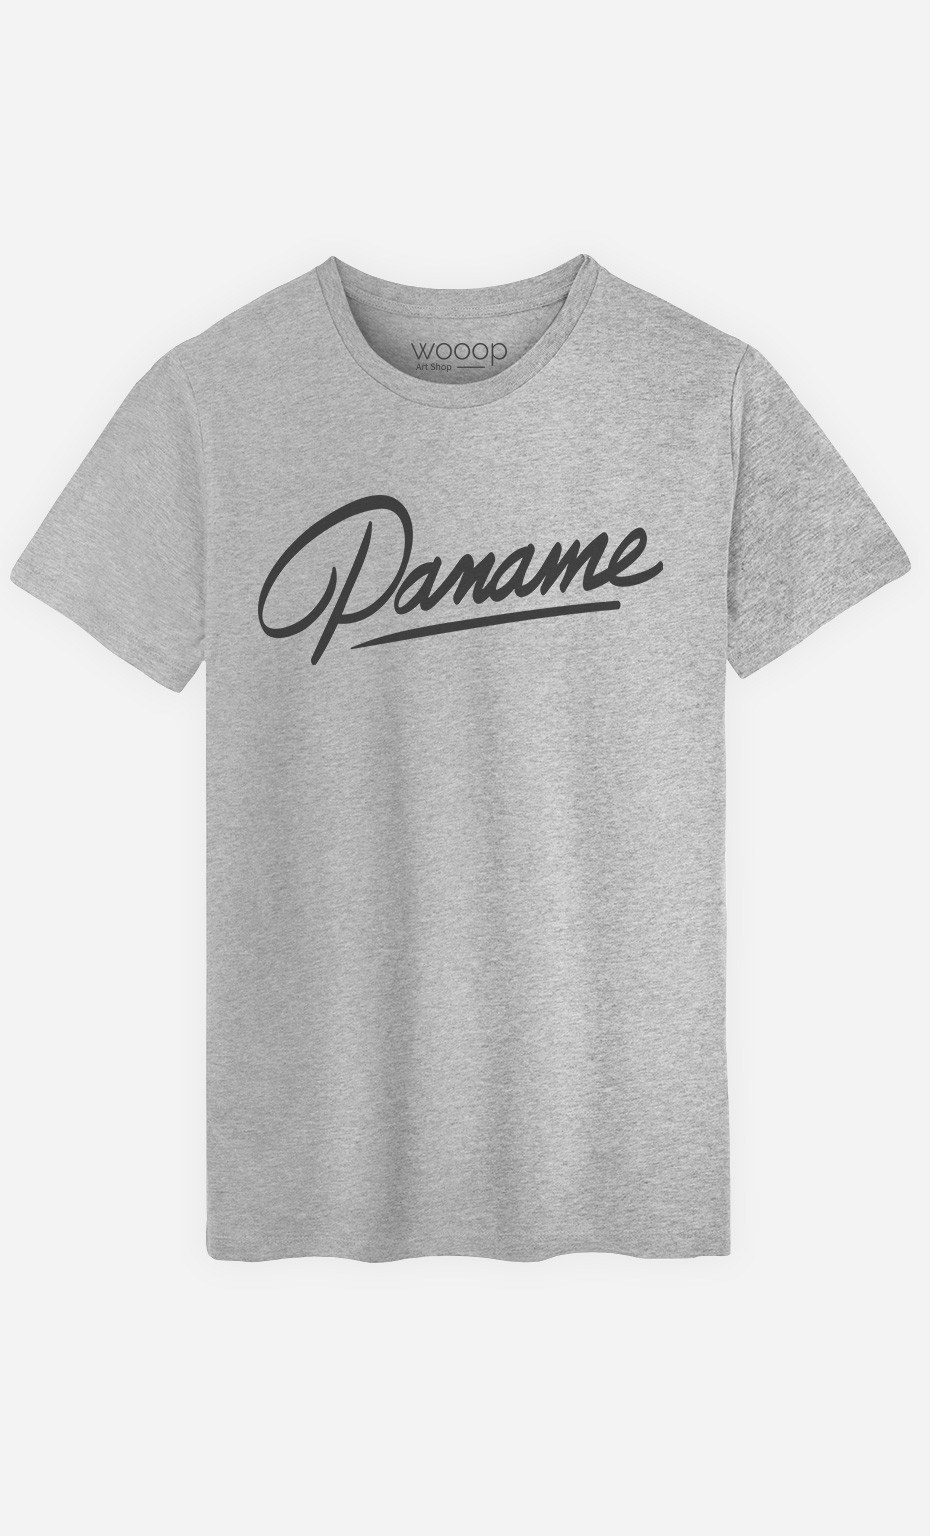 T-Shirt Paname